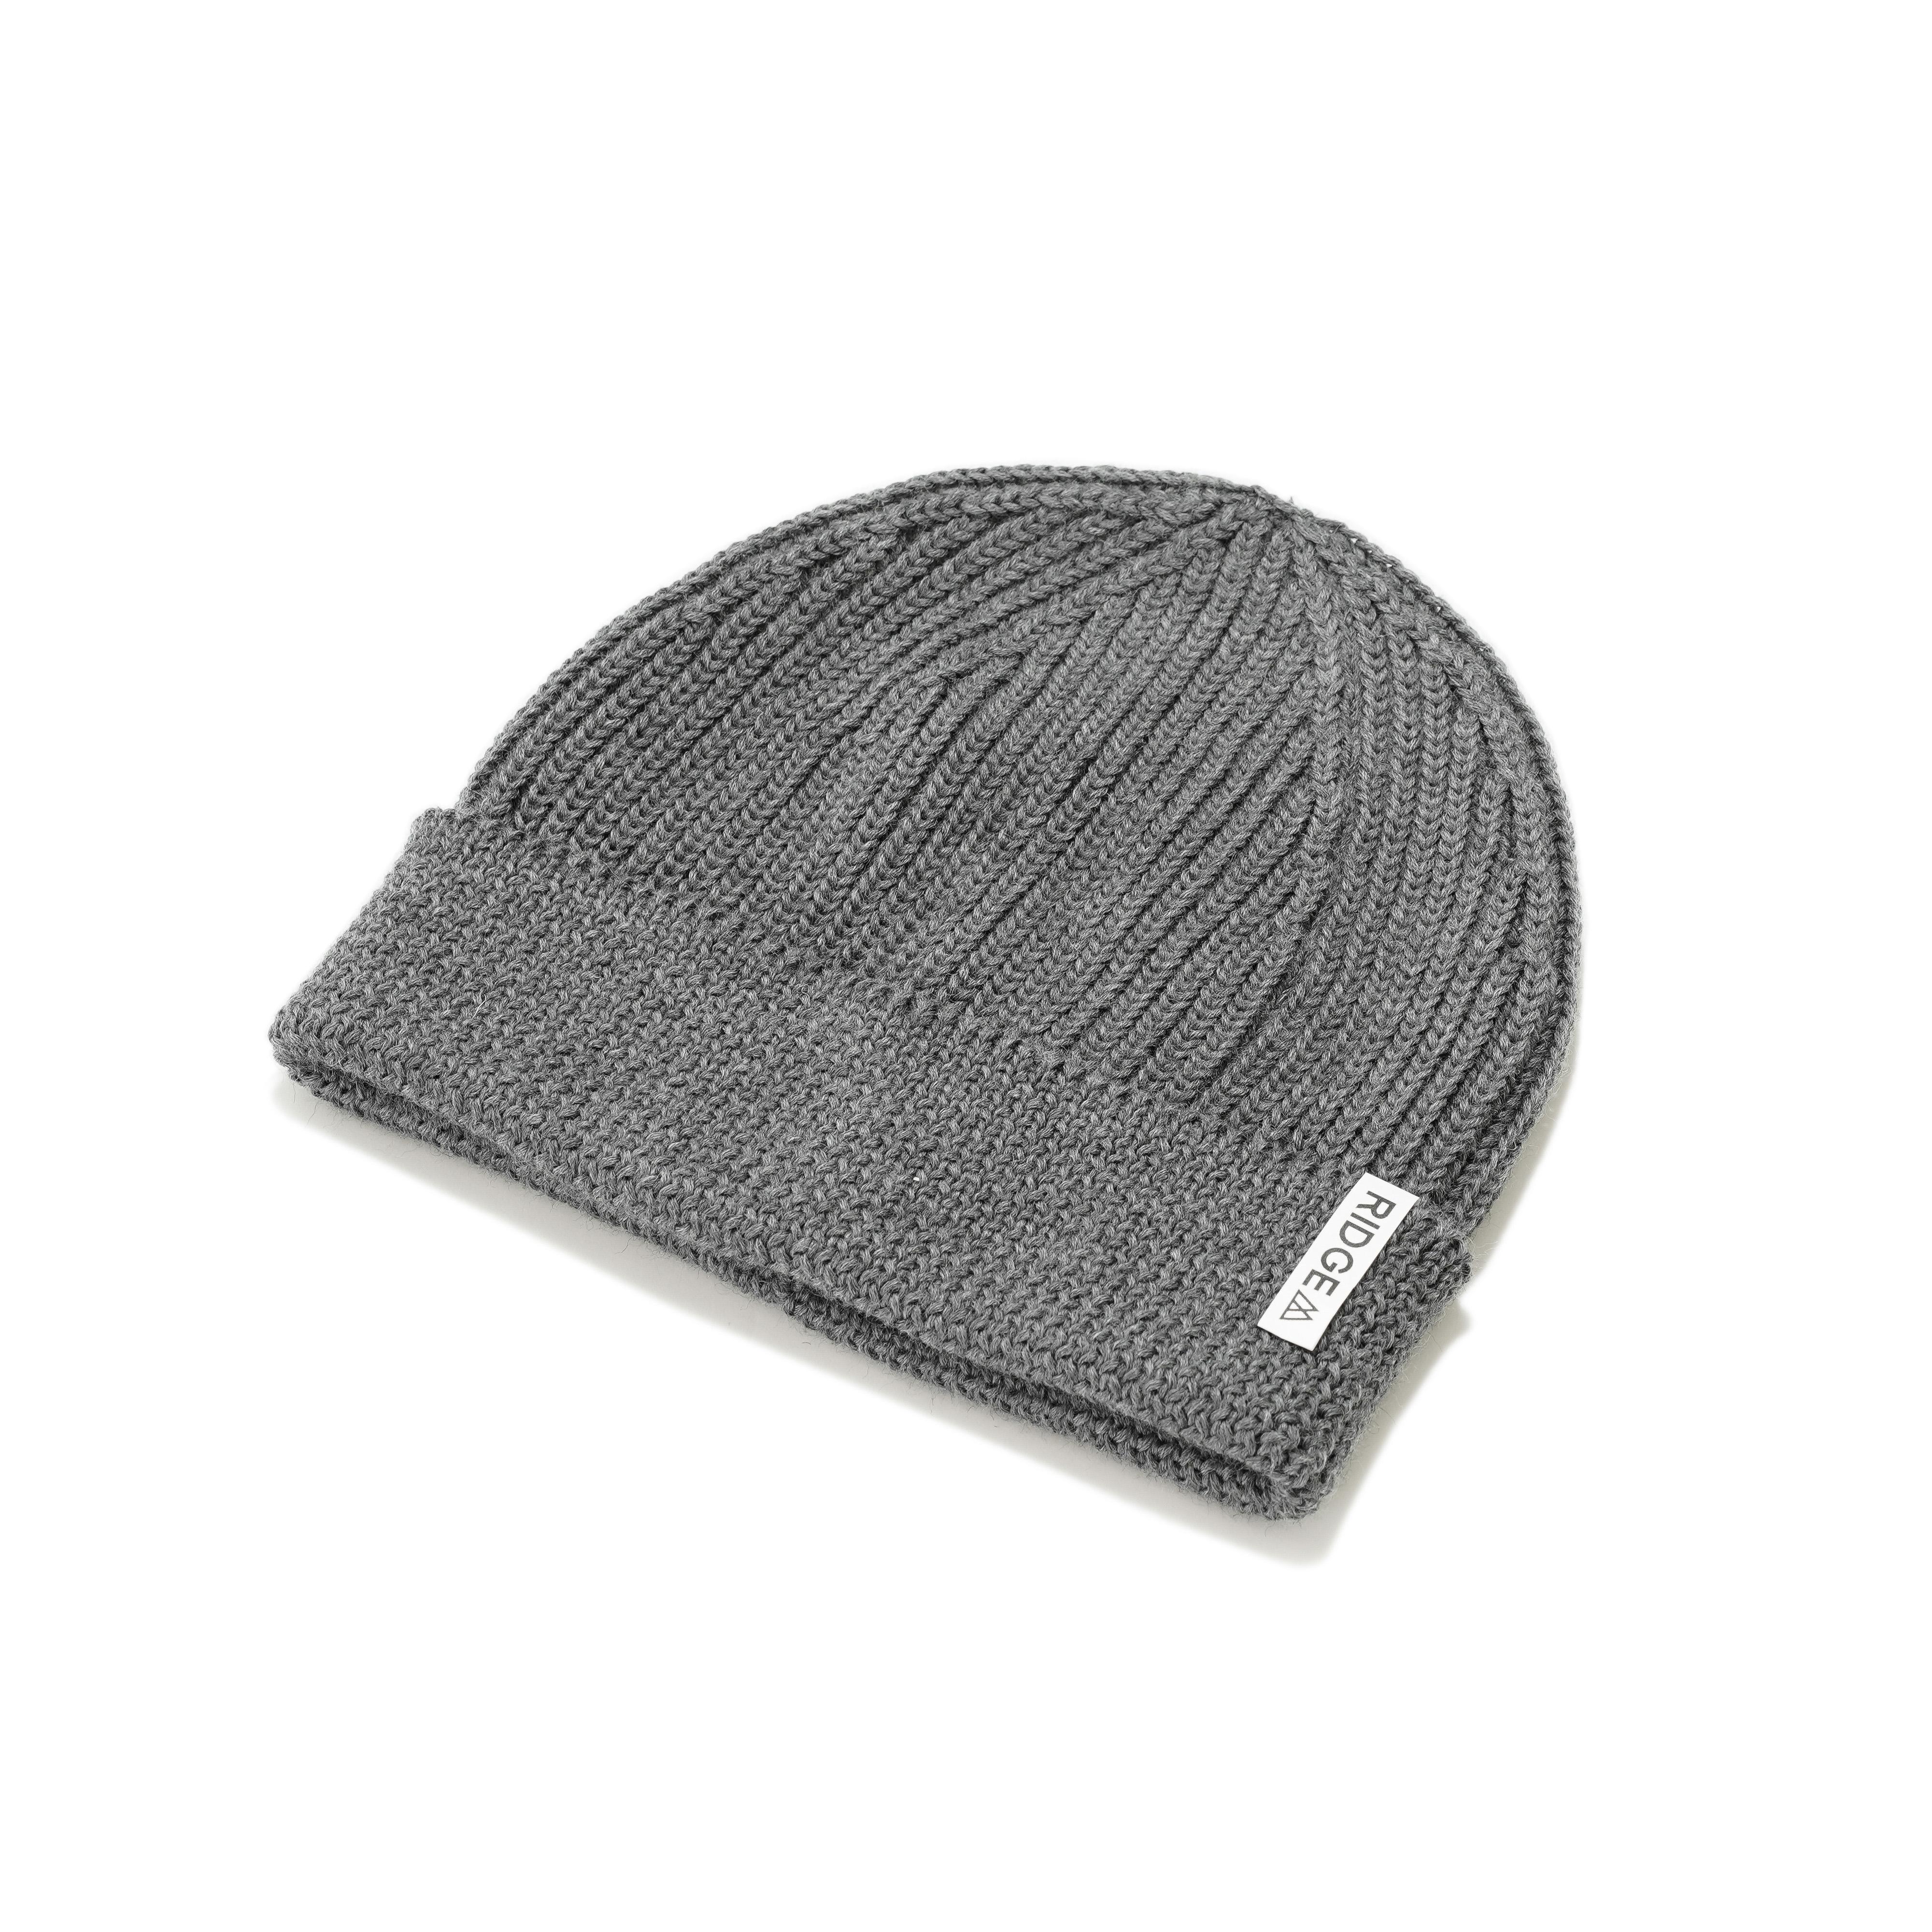 Test Product『Merino Knit Beanie』